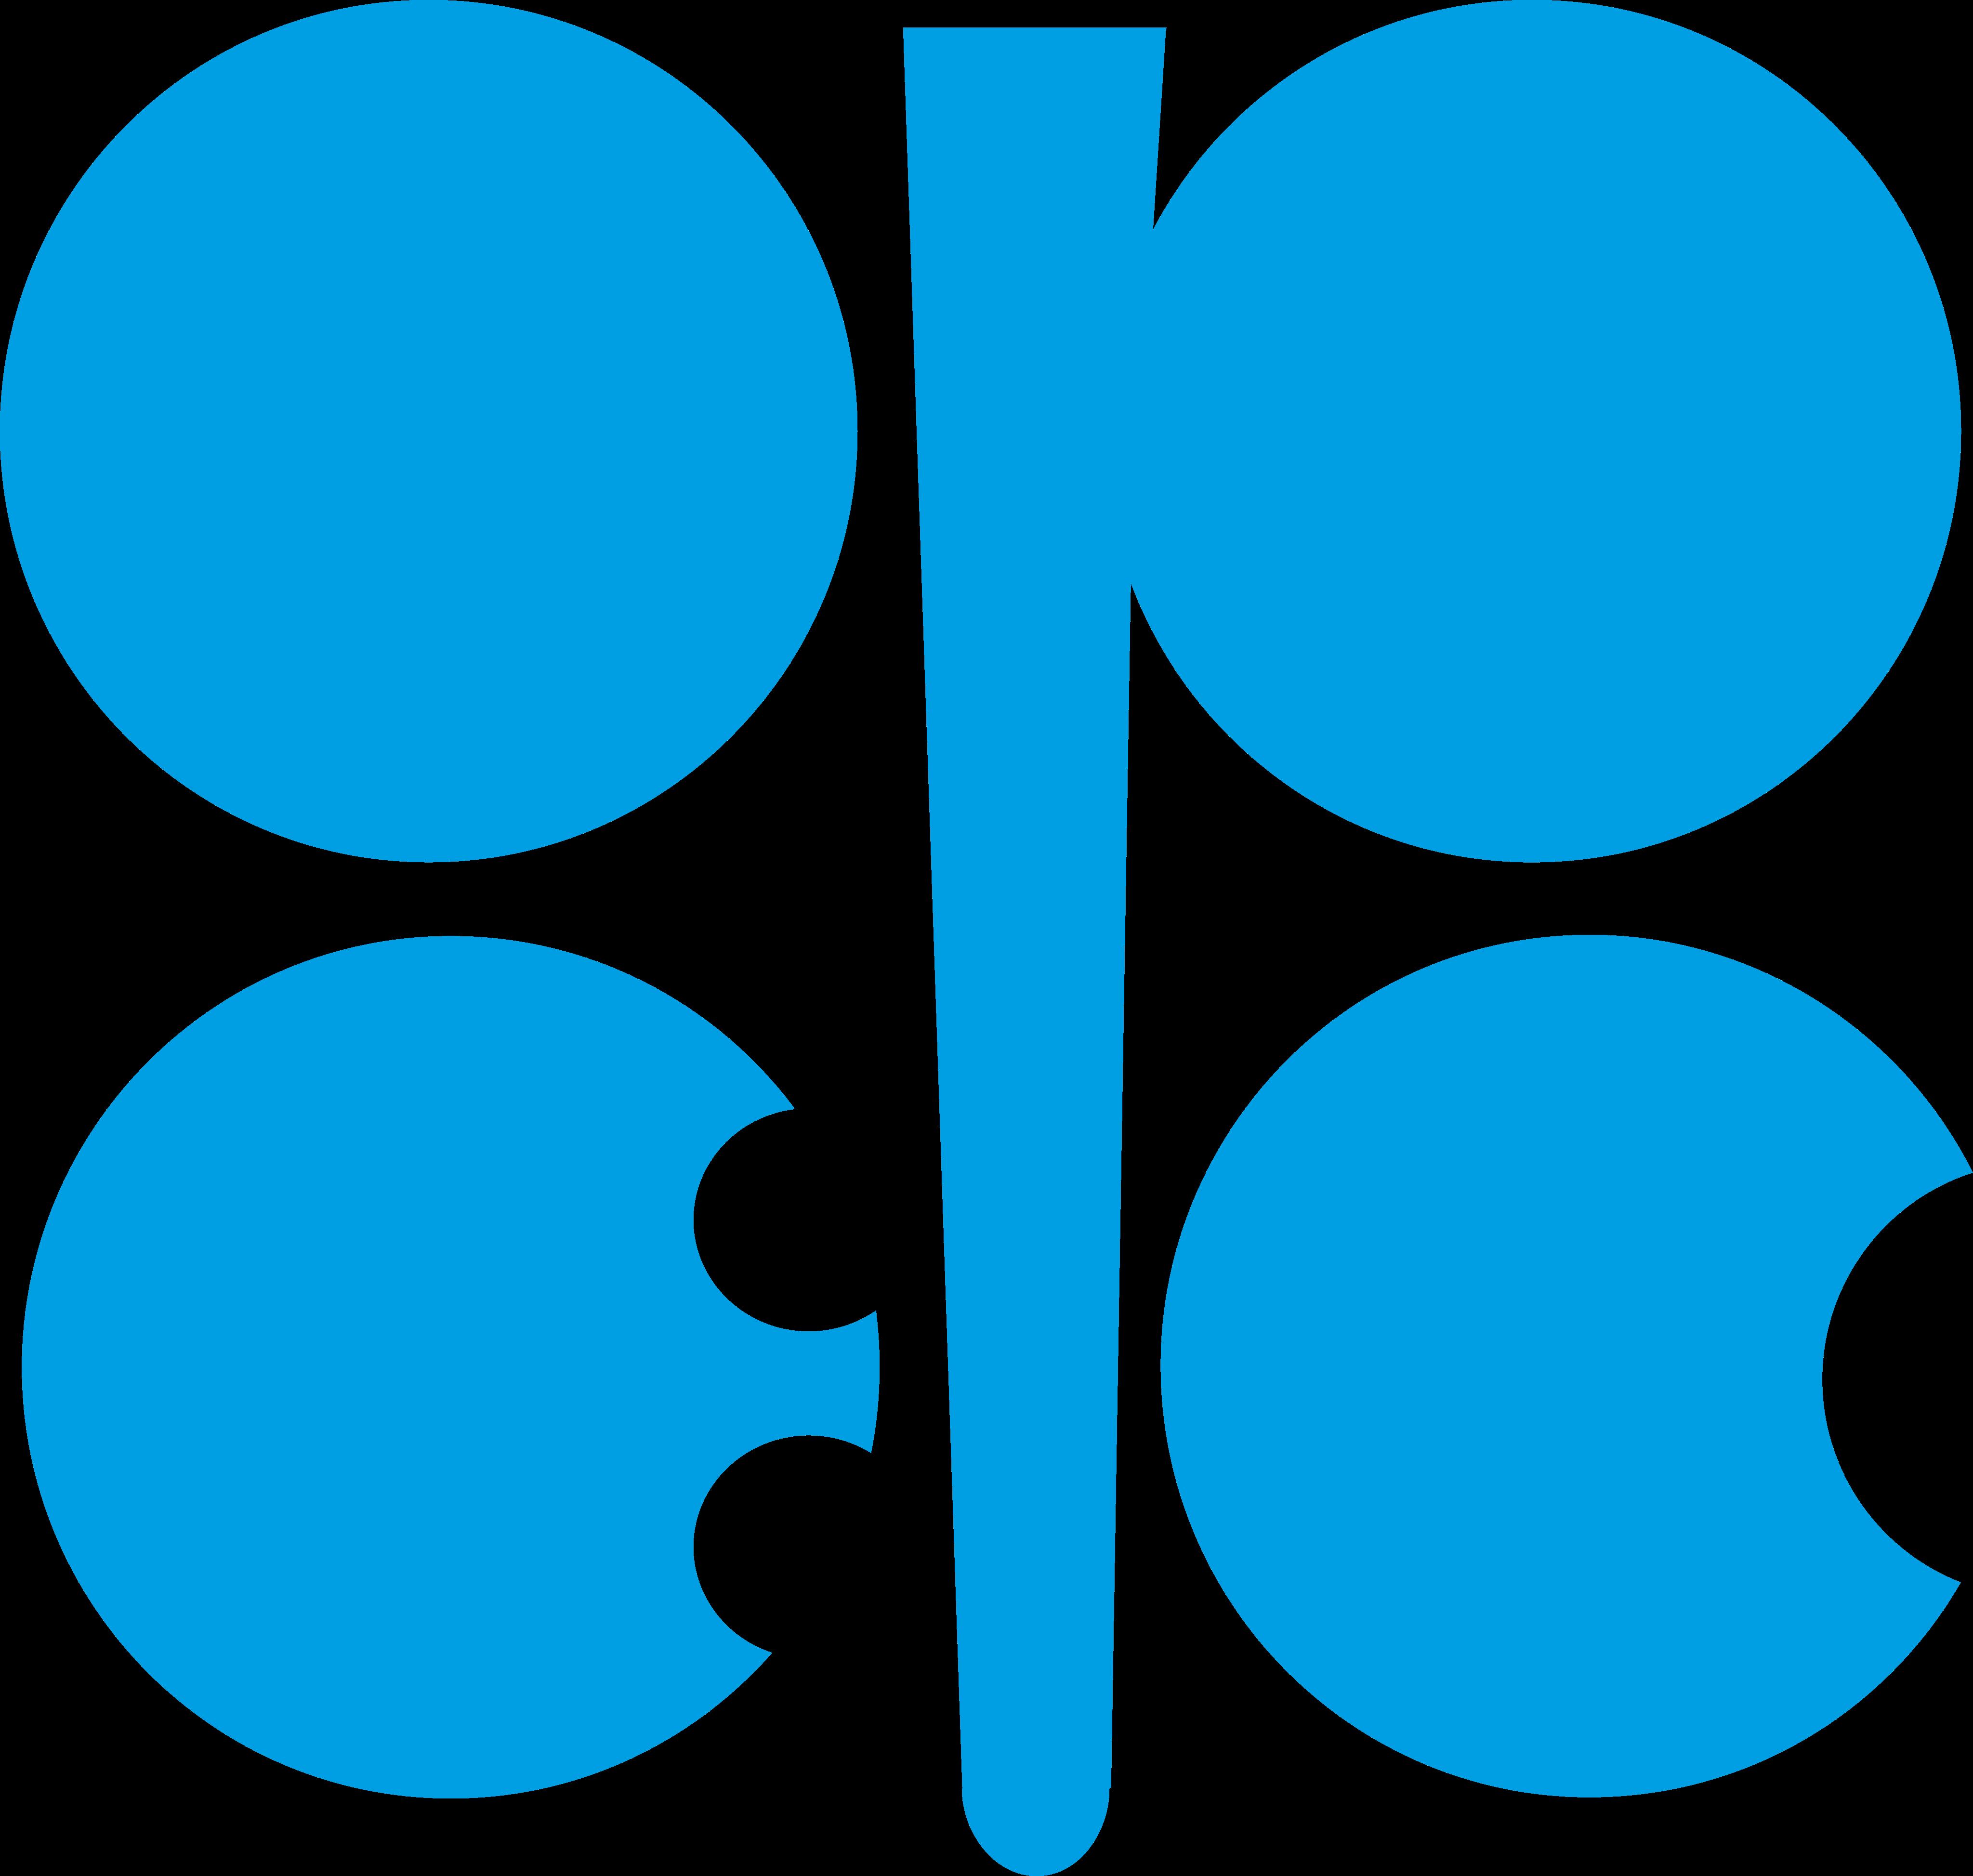 opec logo - OPEC Logo